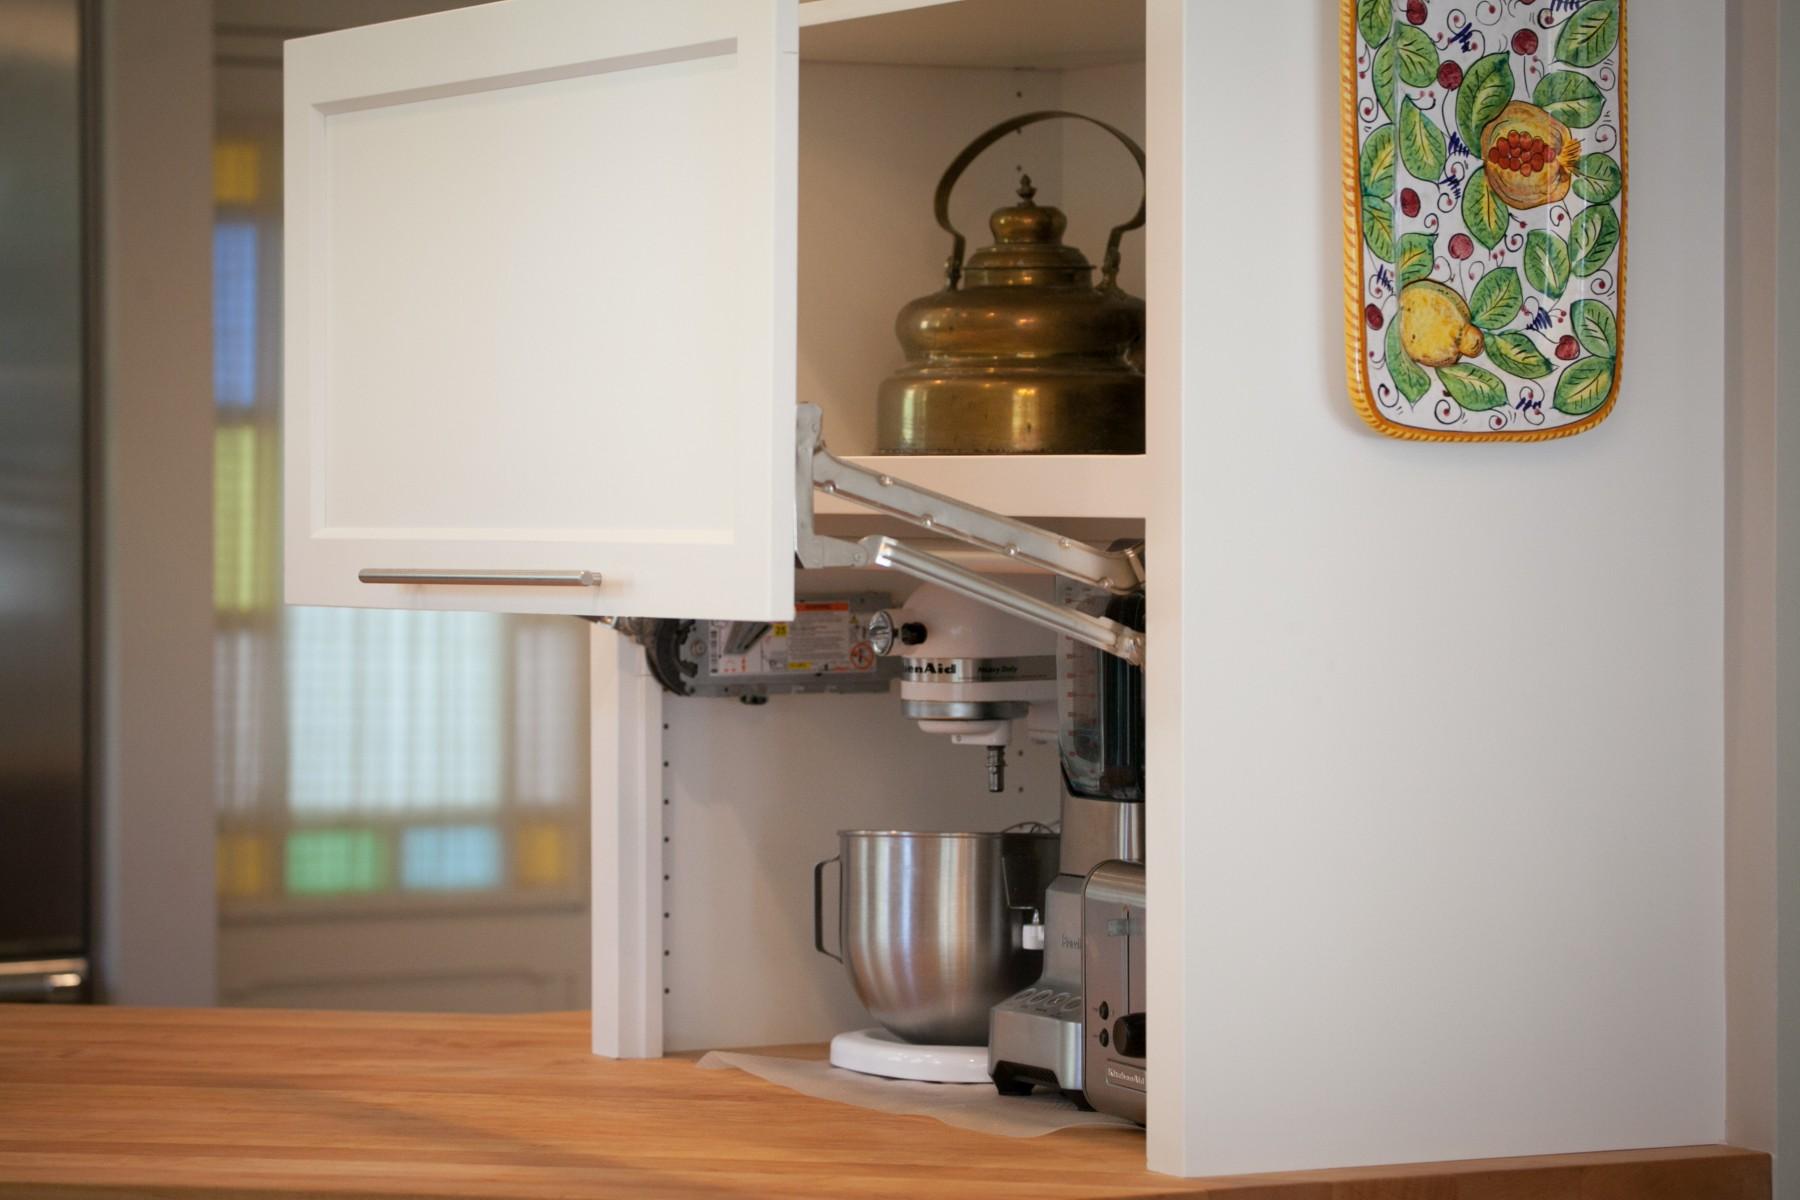 206 NW 8th Street, Corvallis, Oregon-Kitchen appliance garage